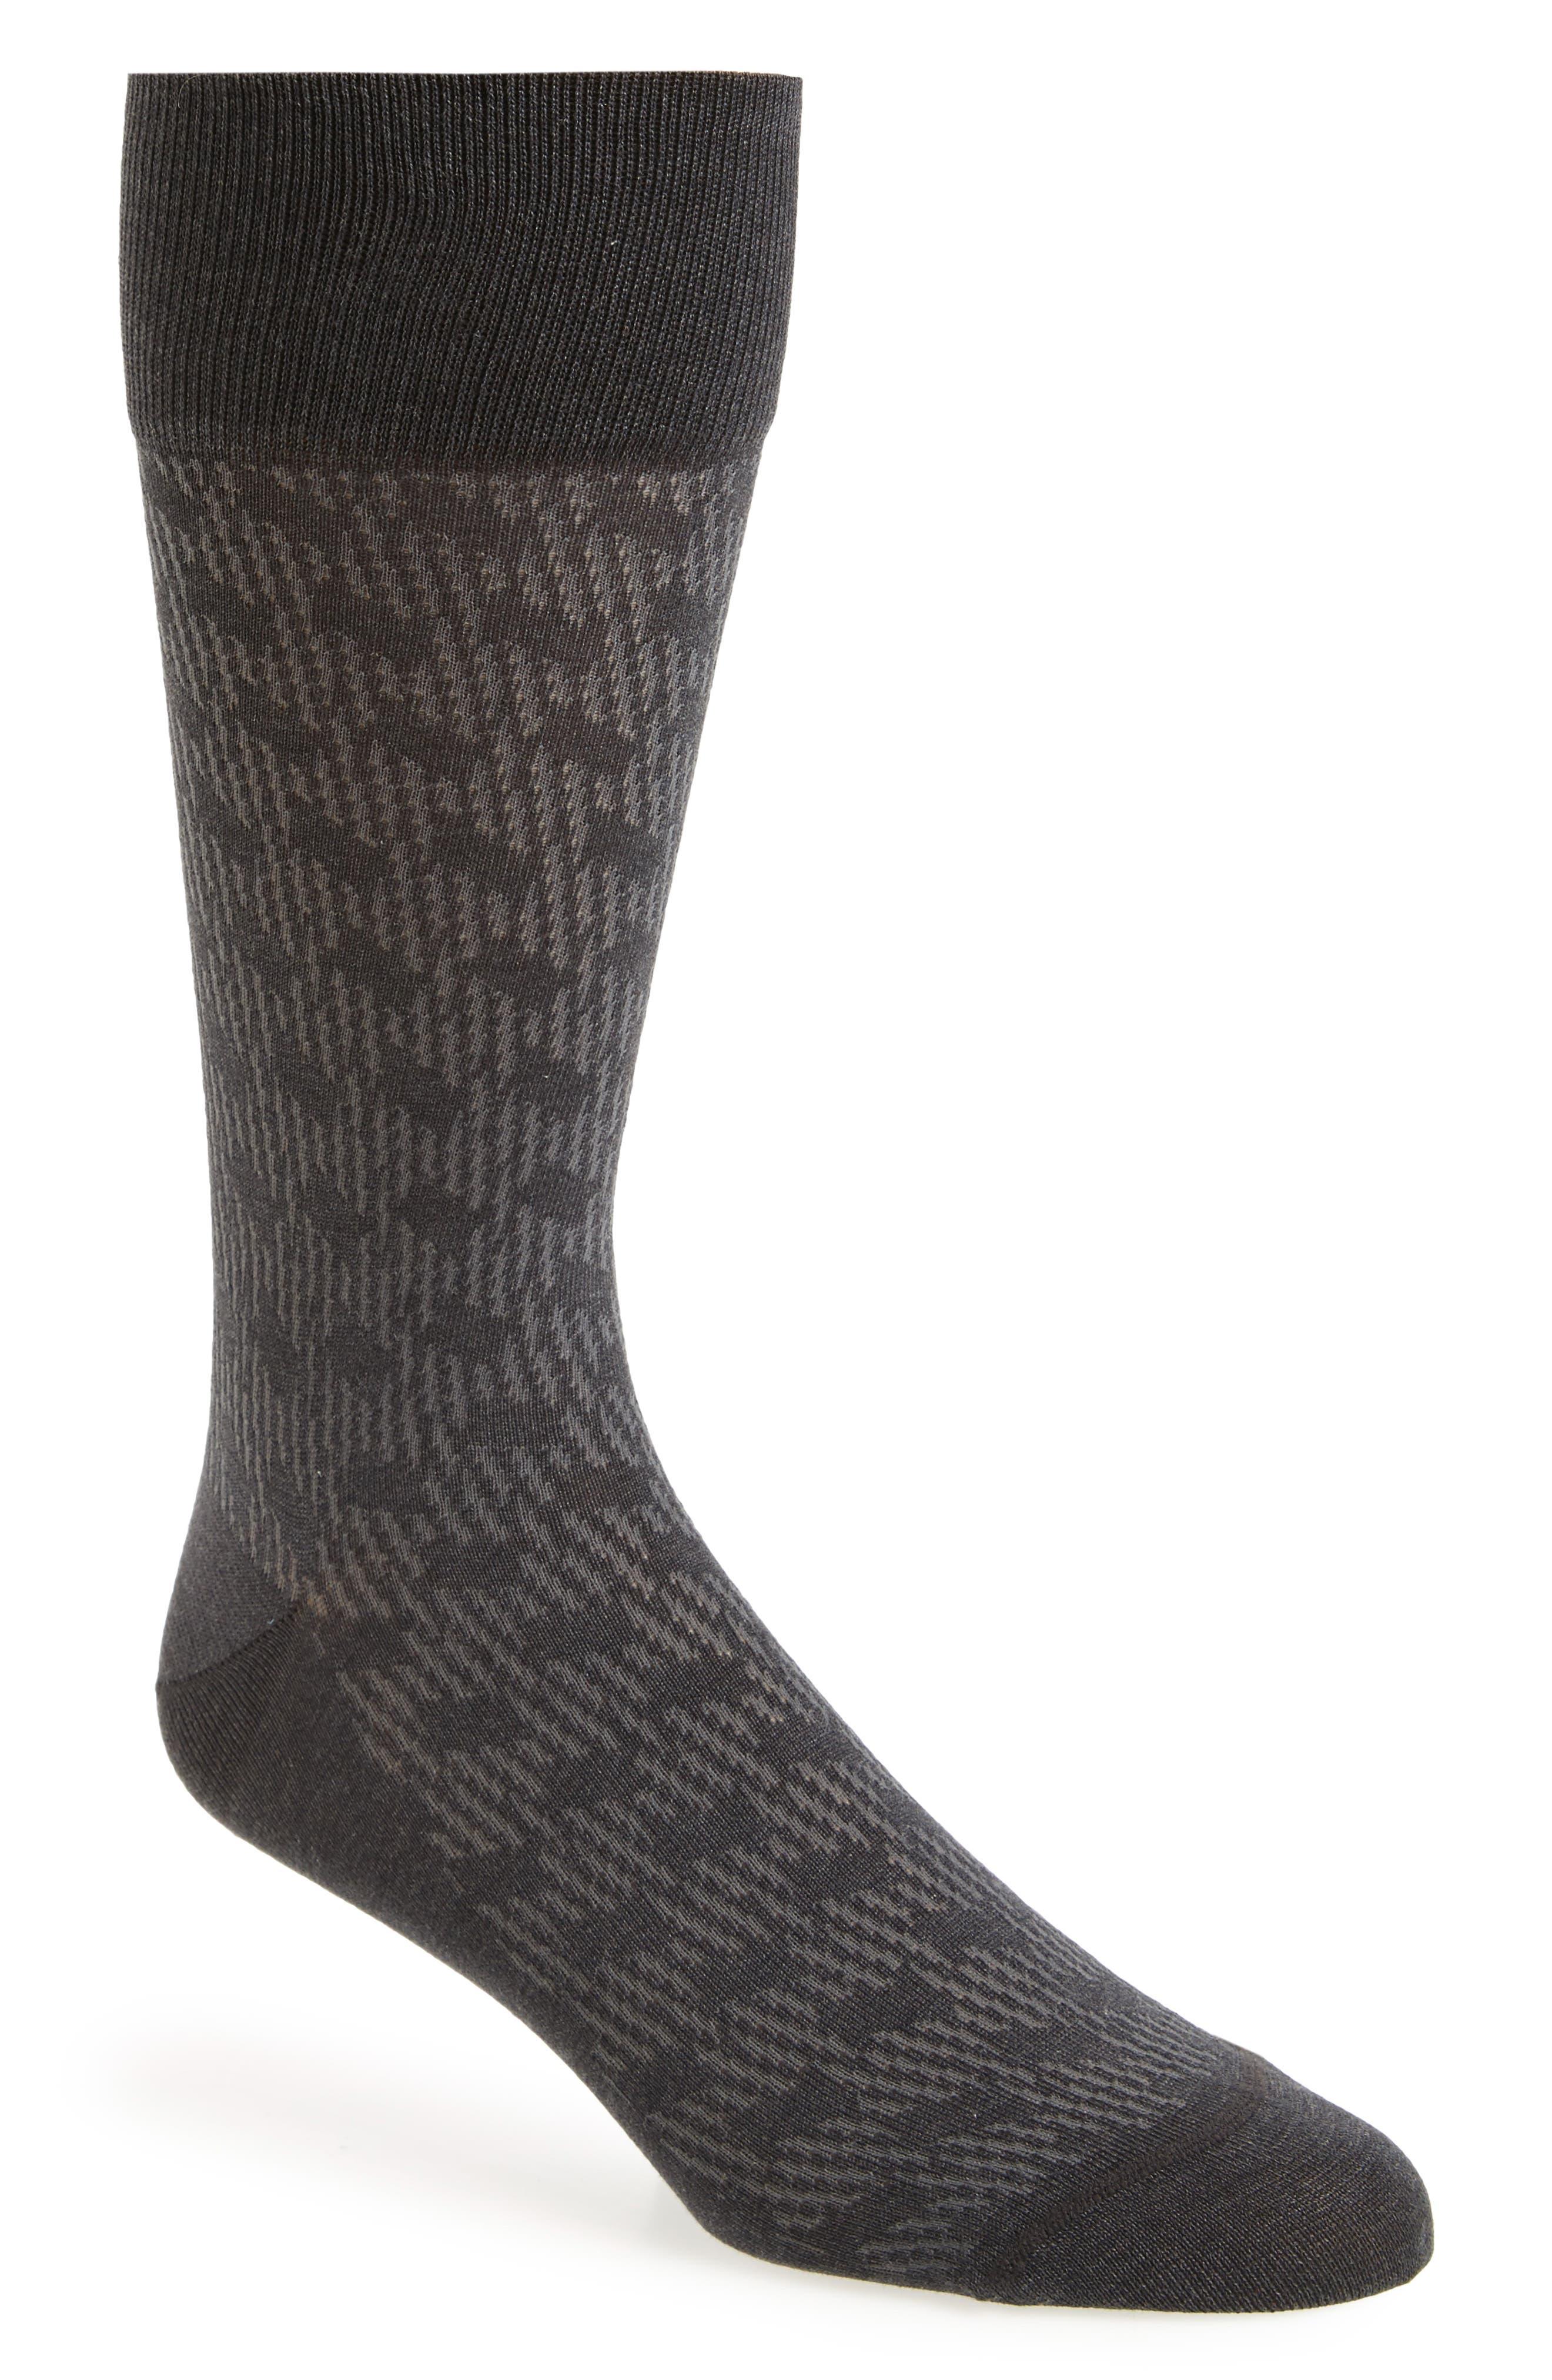 Shadow Rhombus Socks,                         Main,                         color, 021